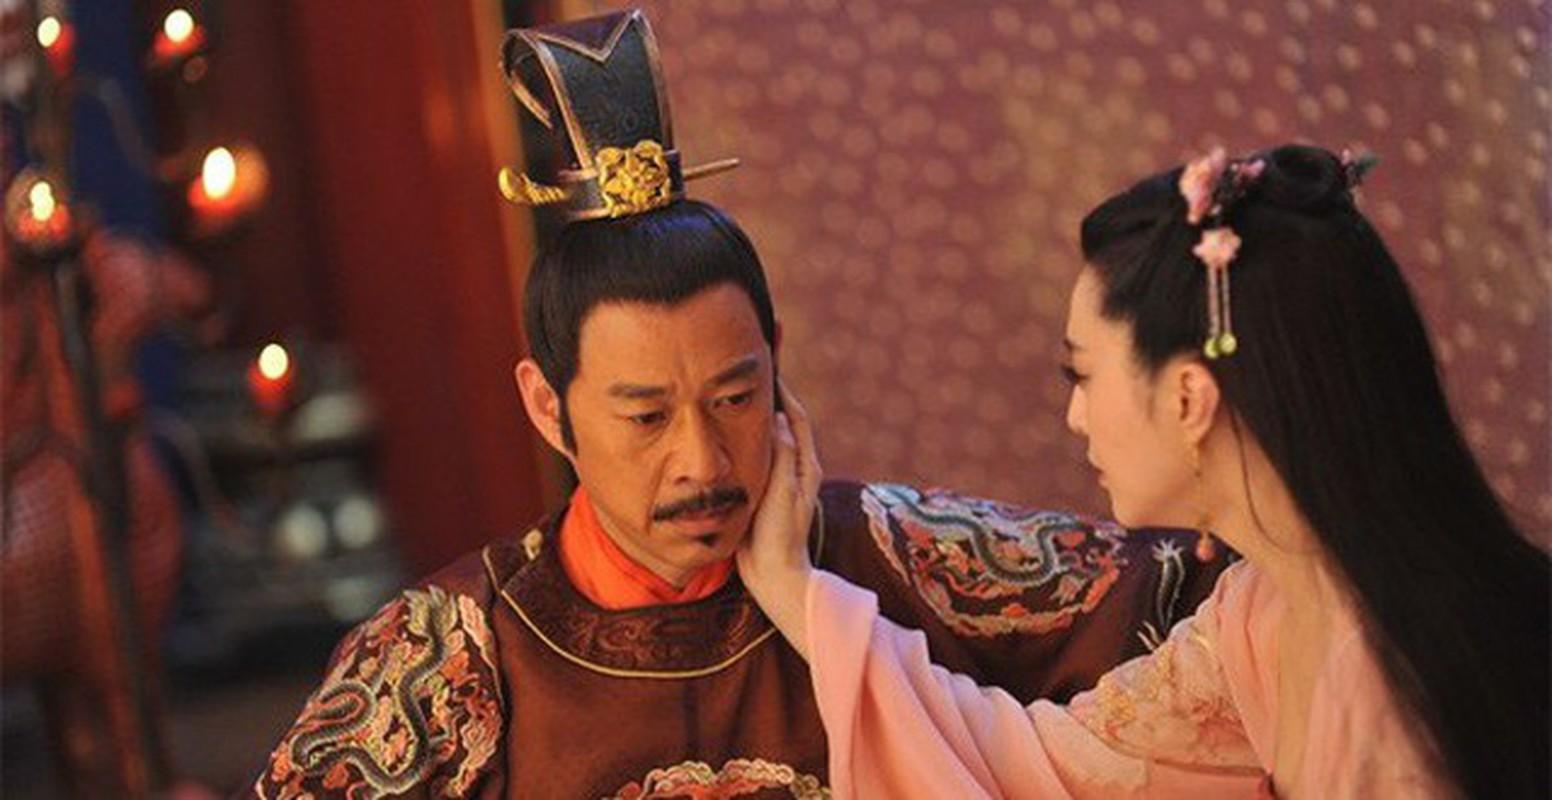 Noi kho cua nhu mau cham soc hoang tu, cong chua Trung Quoc xua-Hinh-7